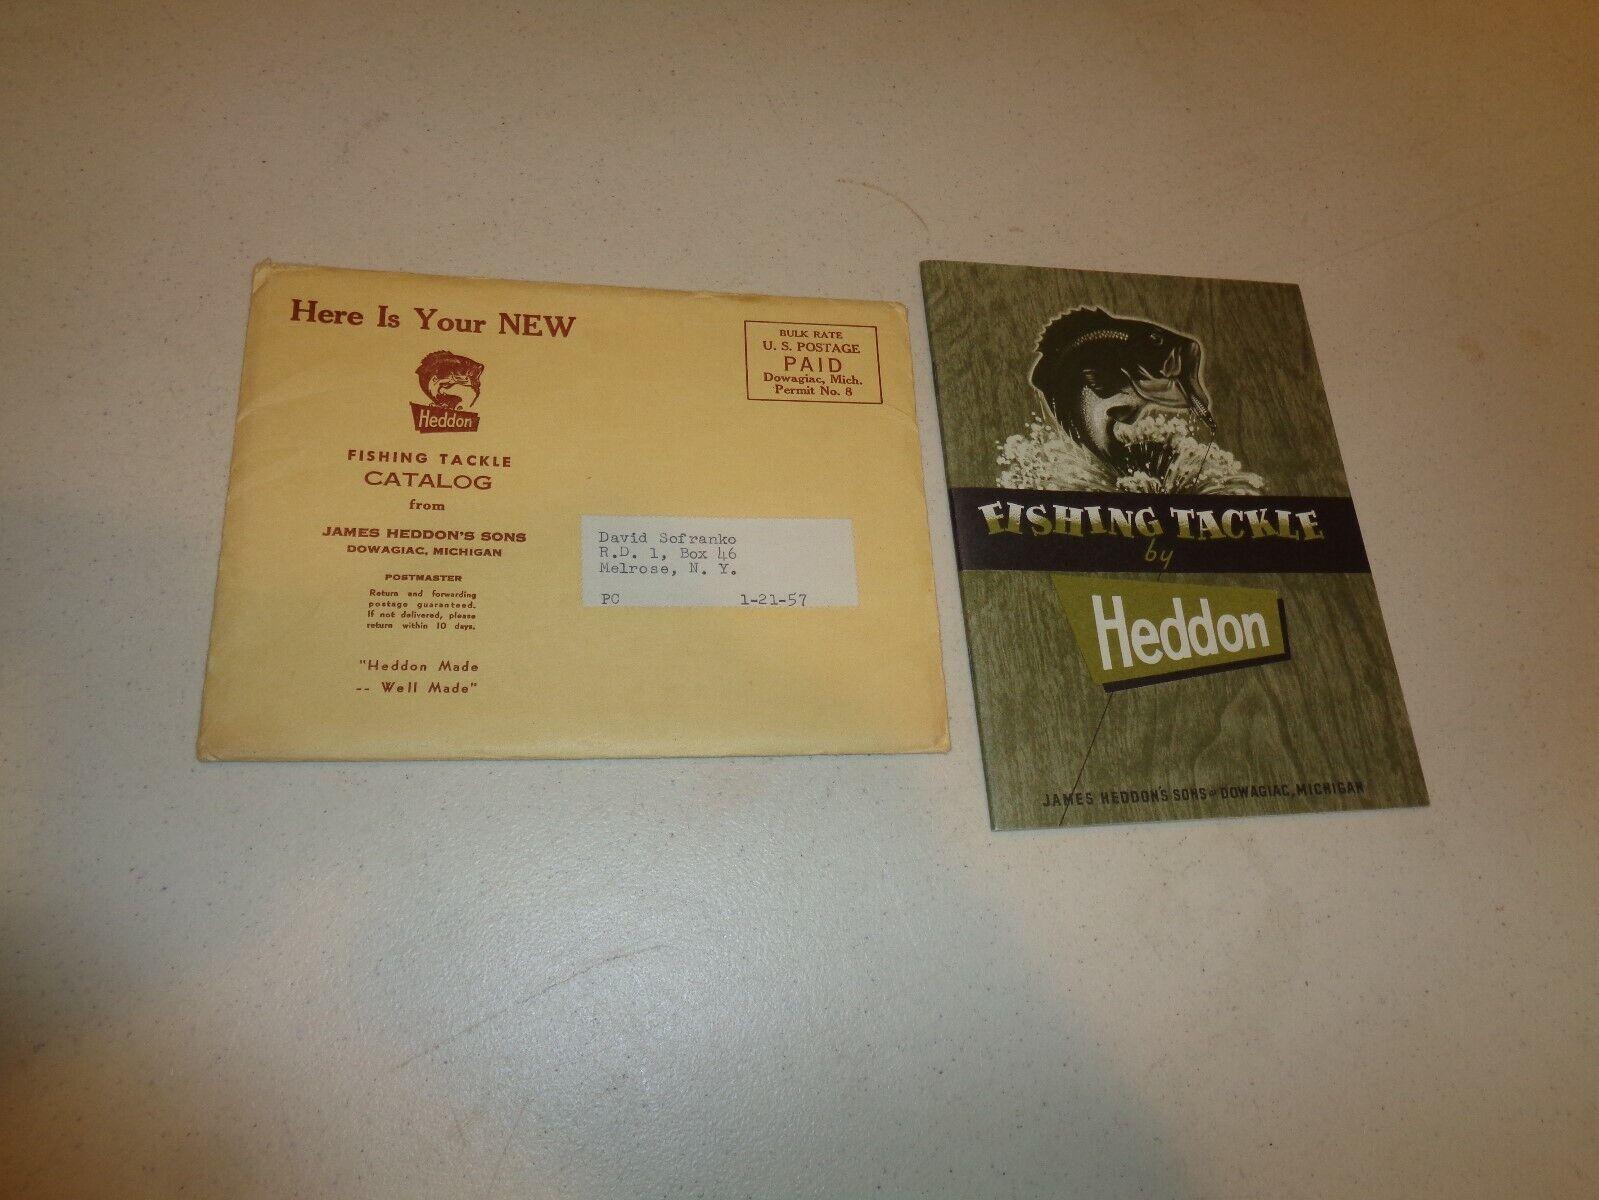 VINTAGE 1957 Heddon Fishing Tackle scatola catalogo dimensioni, 5 x 634 CON autobusTA